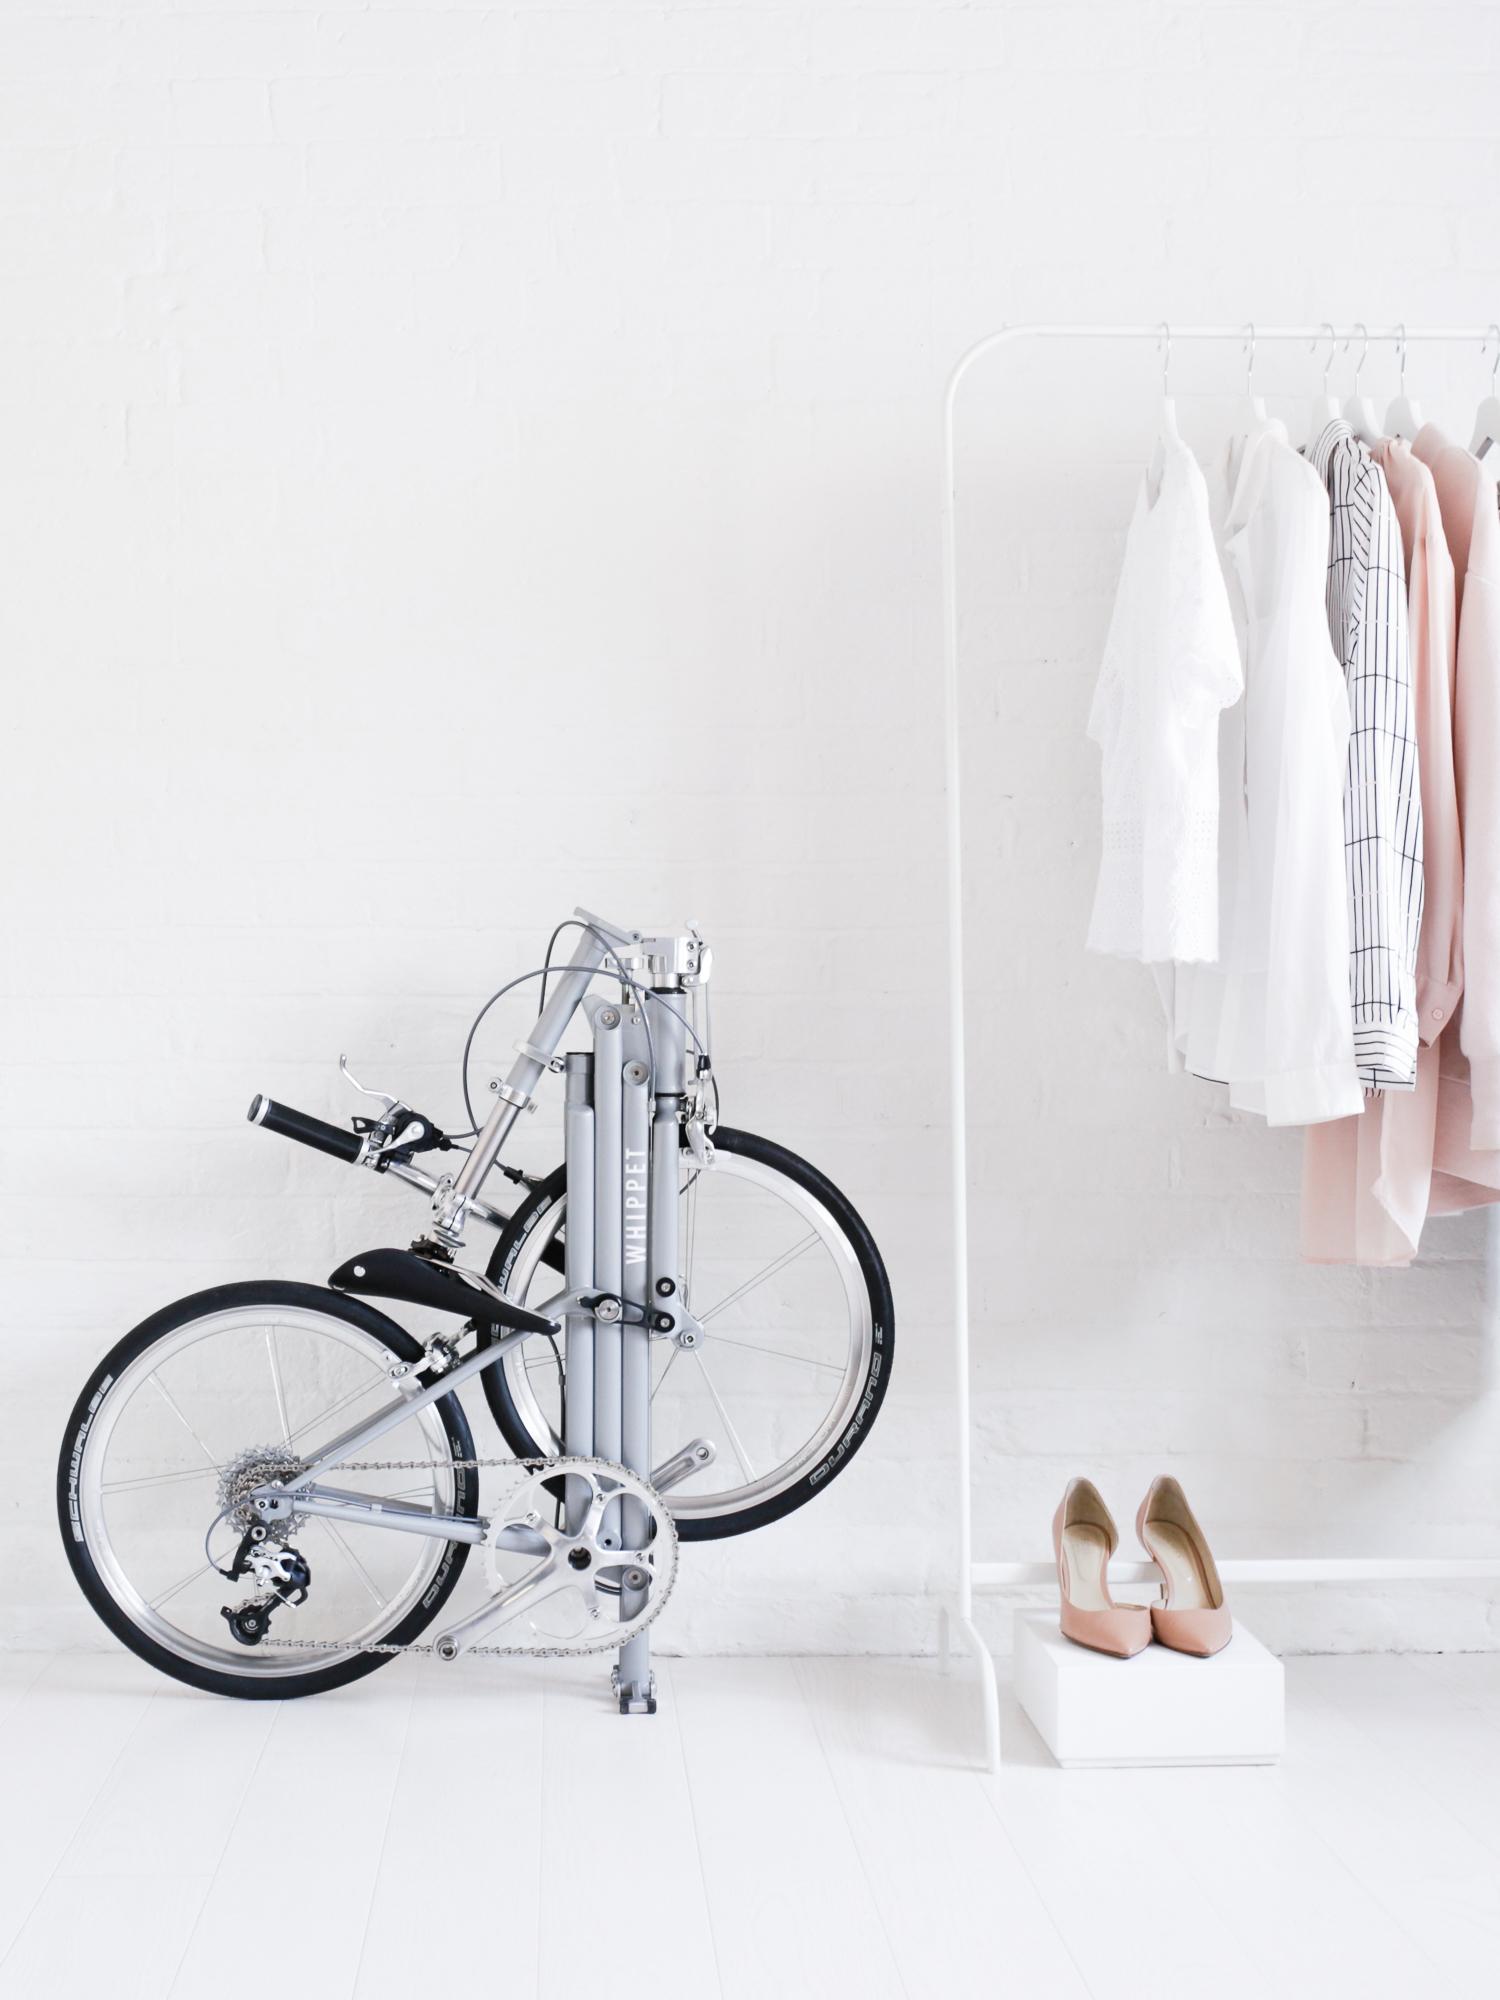 Whippet Bicycle - a new British folding bike